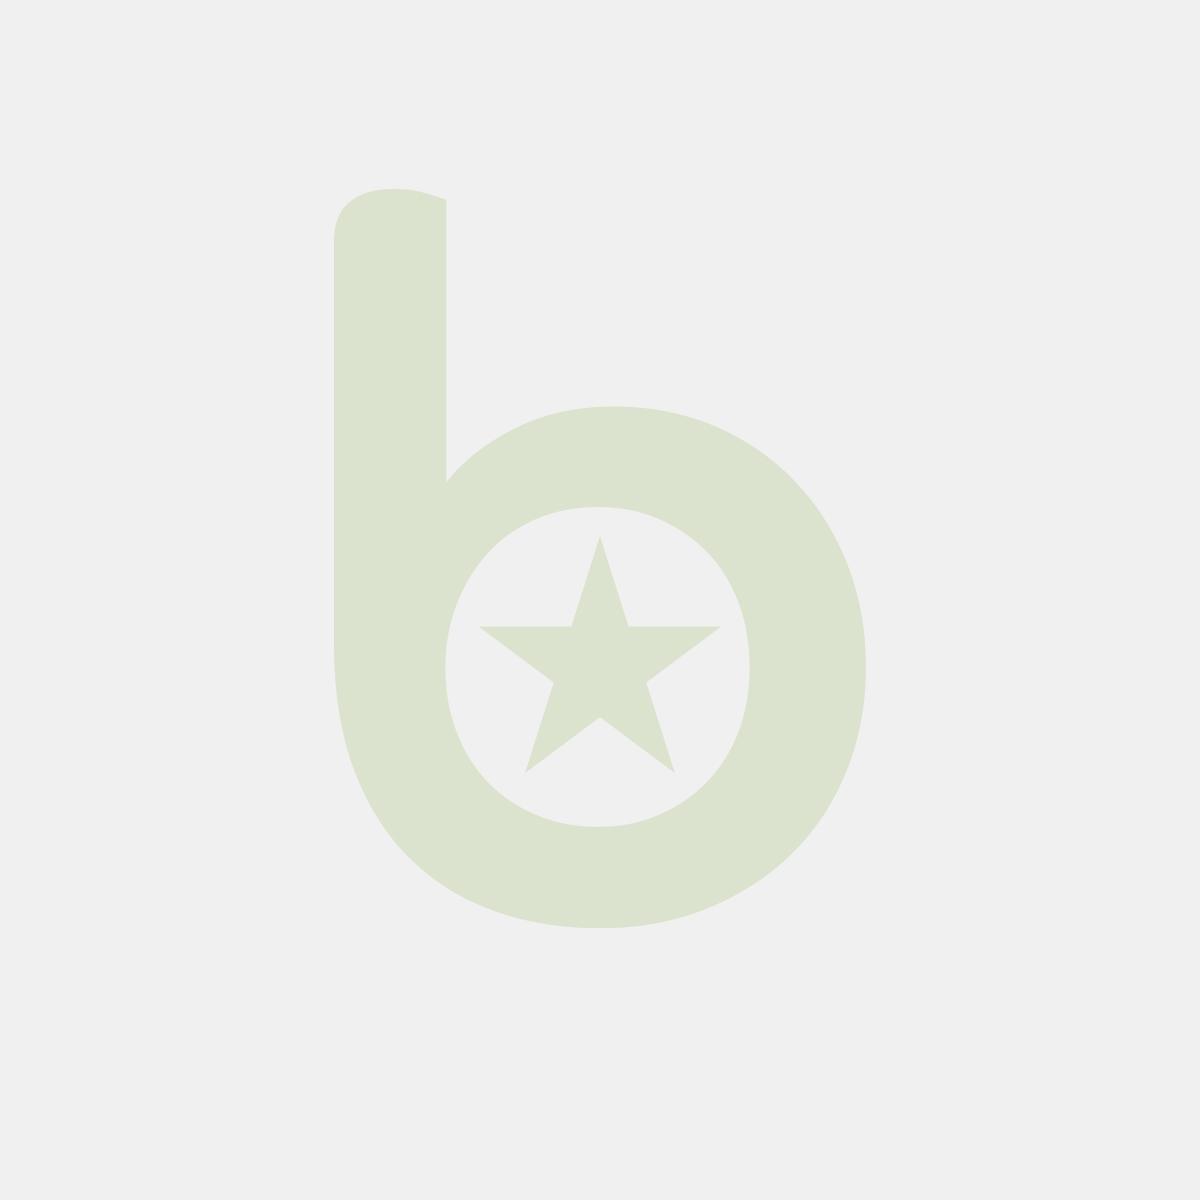 Pucharek FINGERFOOD biały, 7/6 cm PS, 25 szt. w opakowaniu